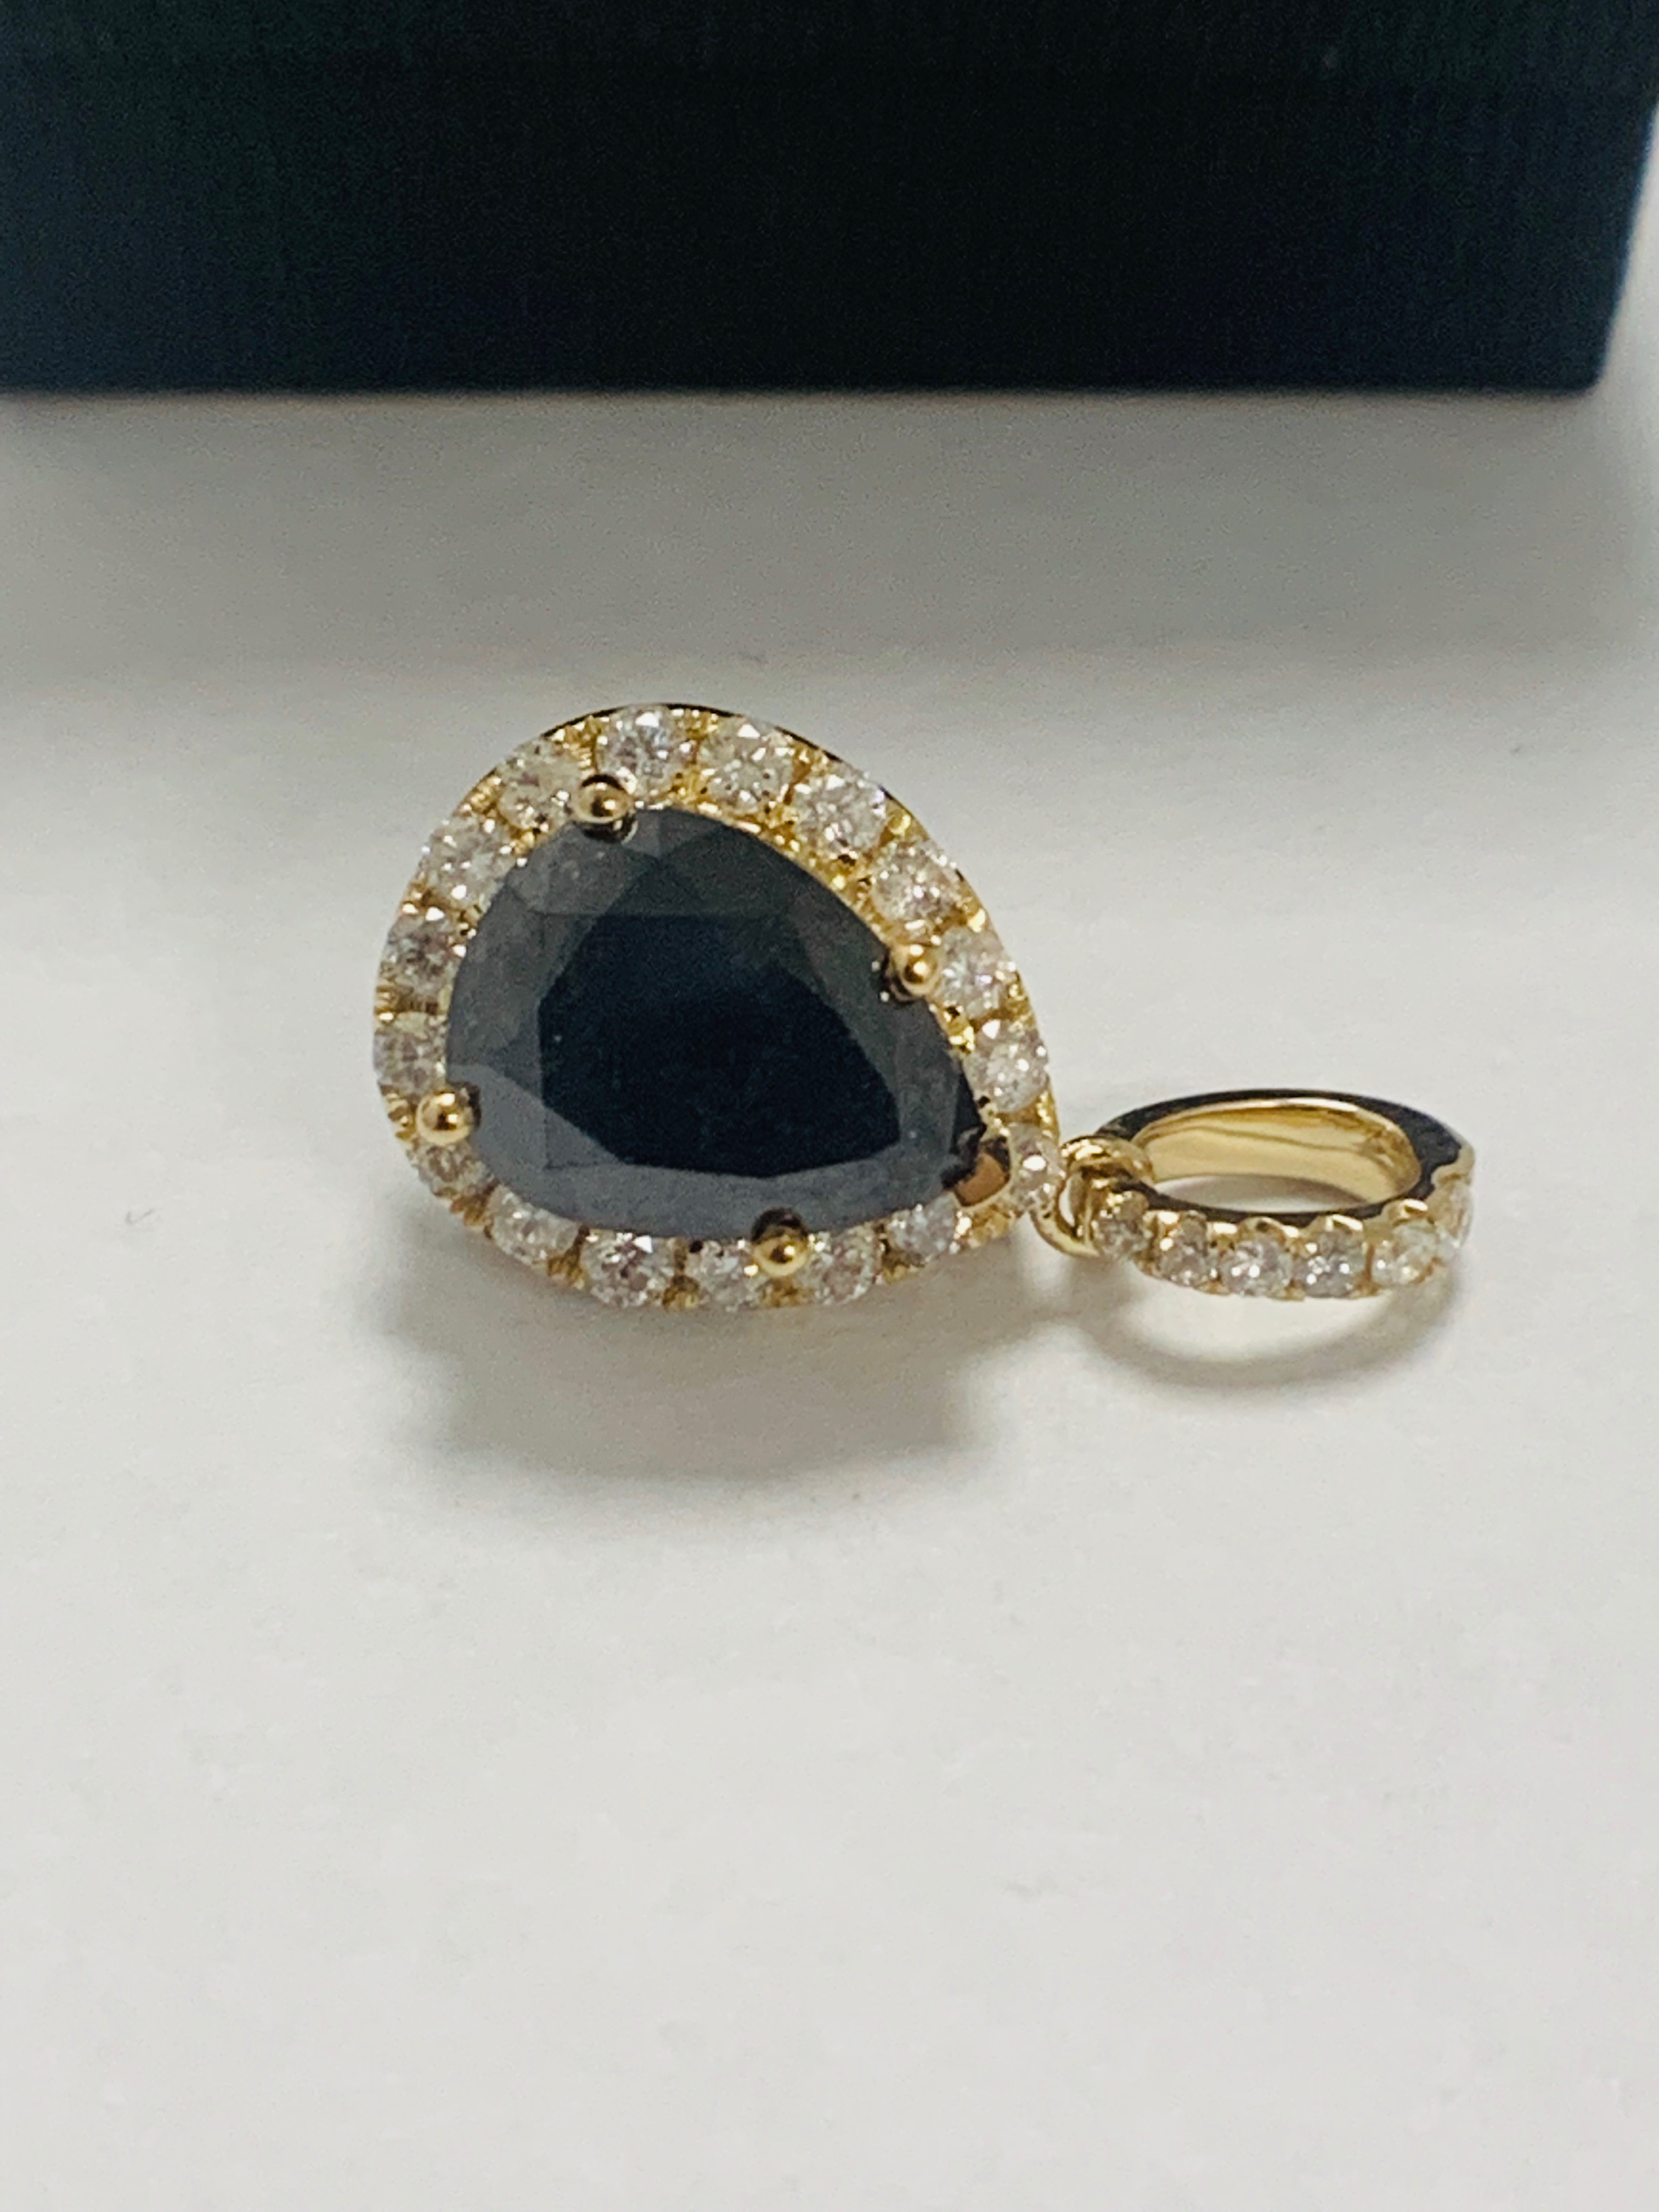 14ct Yellow Gold Diamond pendant featuring centre, pear cut, black Diamond (2.86ct) - Image 3 of 6